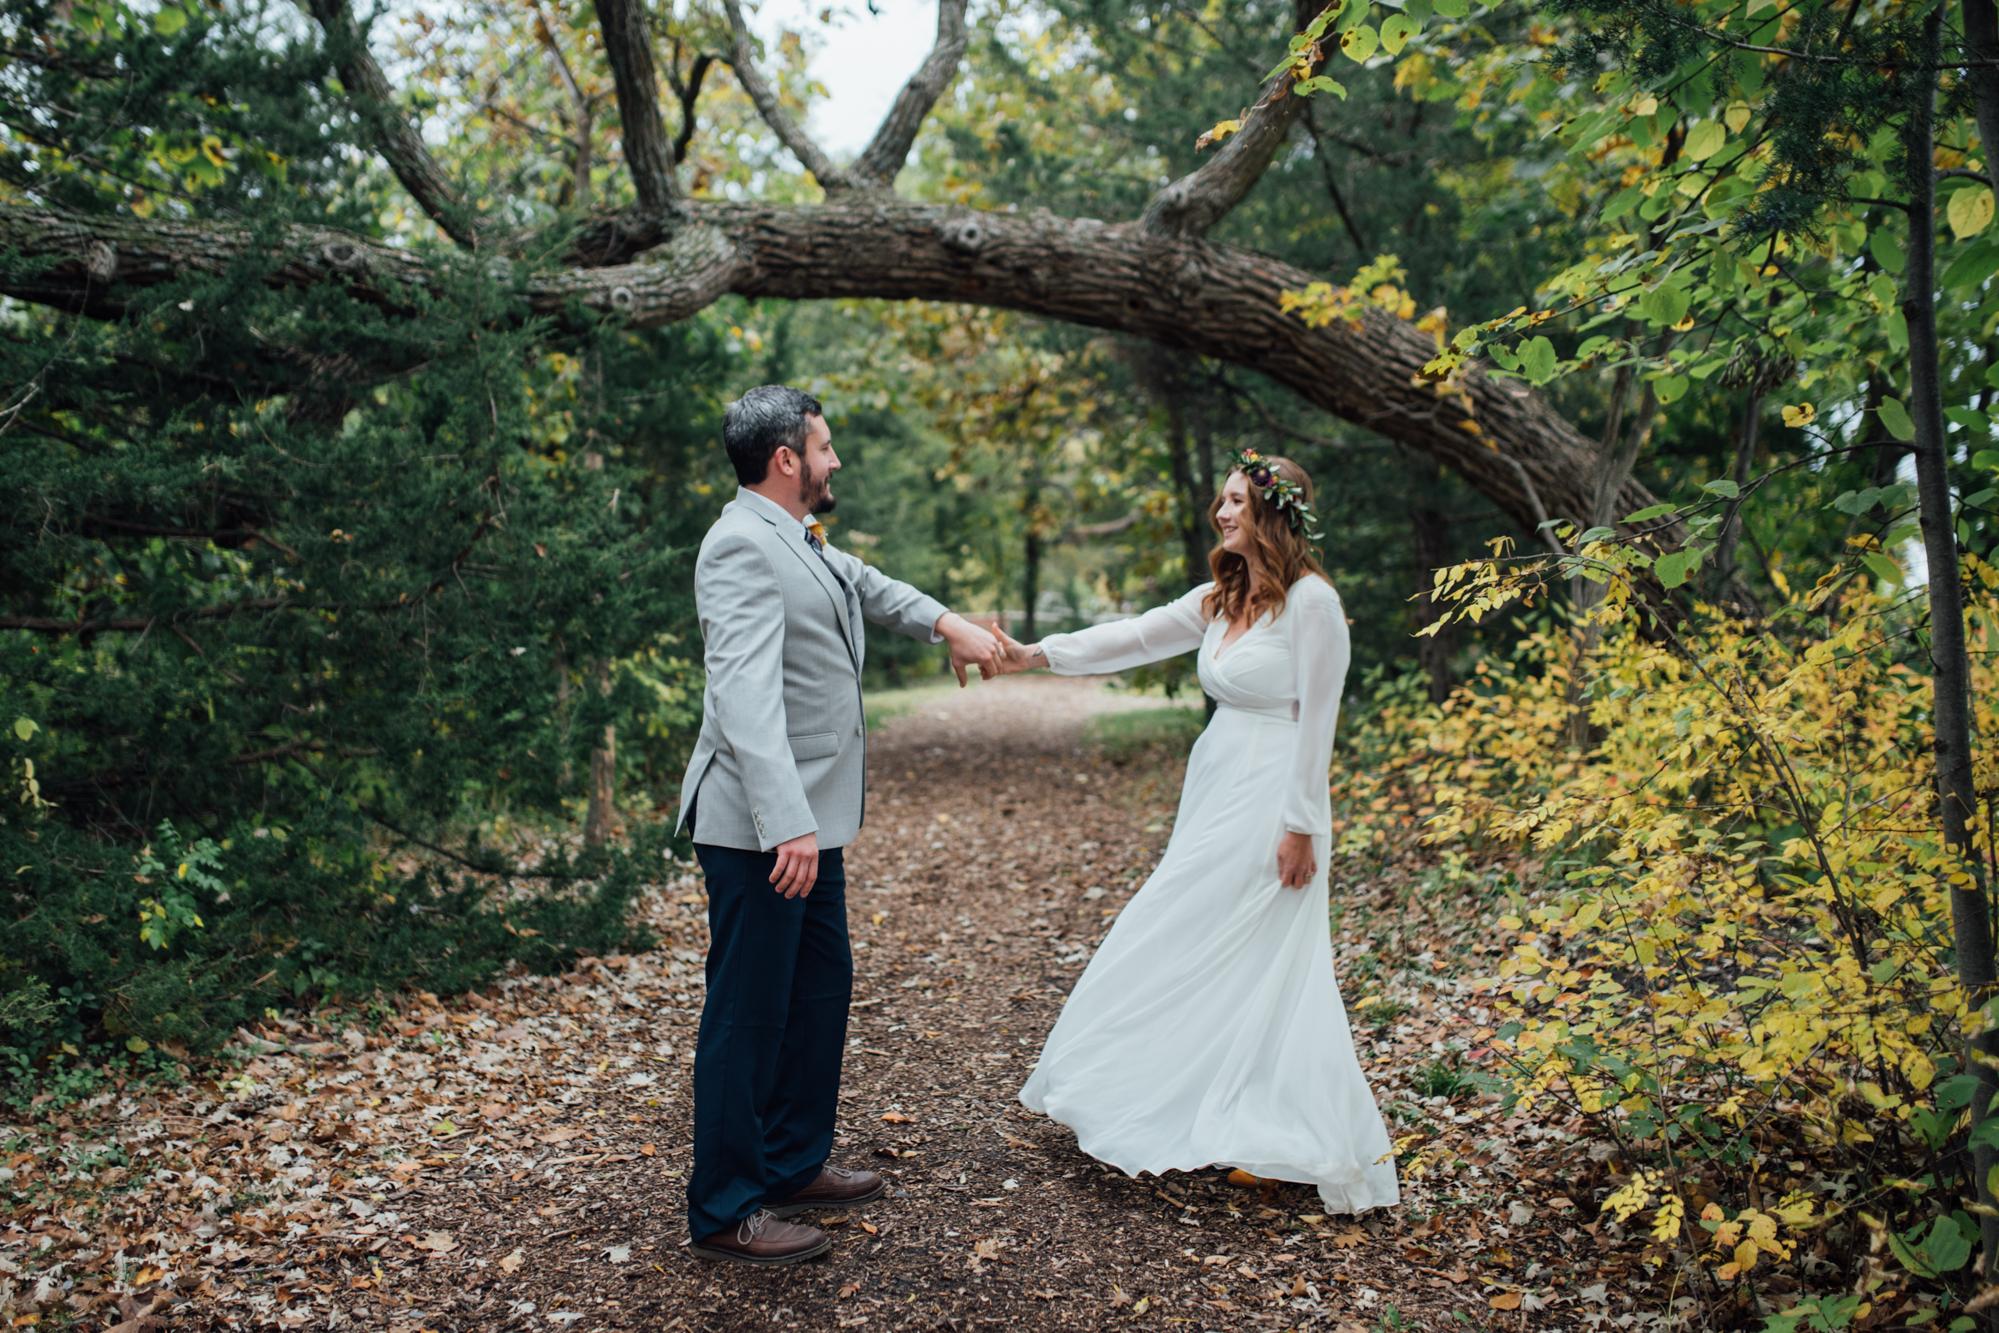 minneapolis-wedding-photographer-1-34.jpg